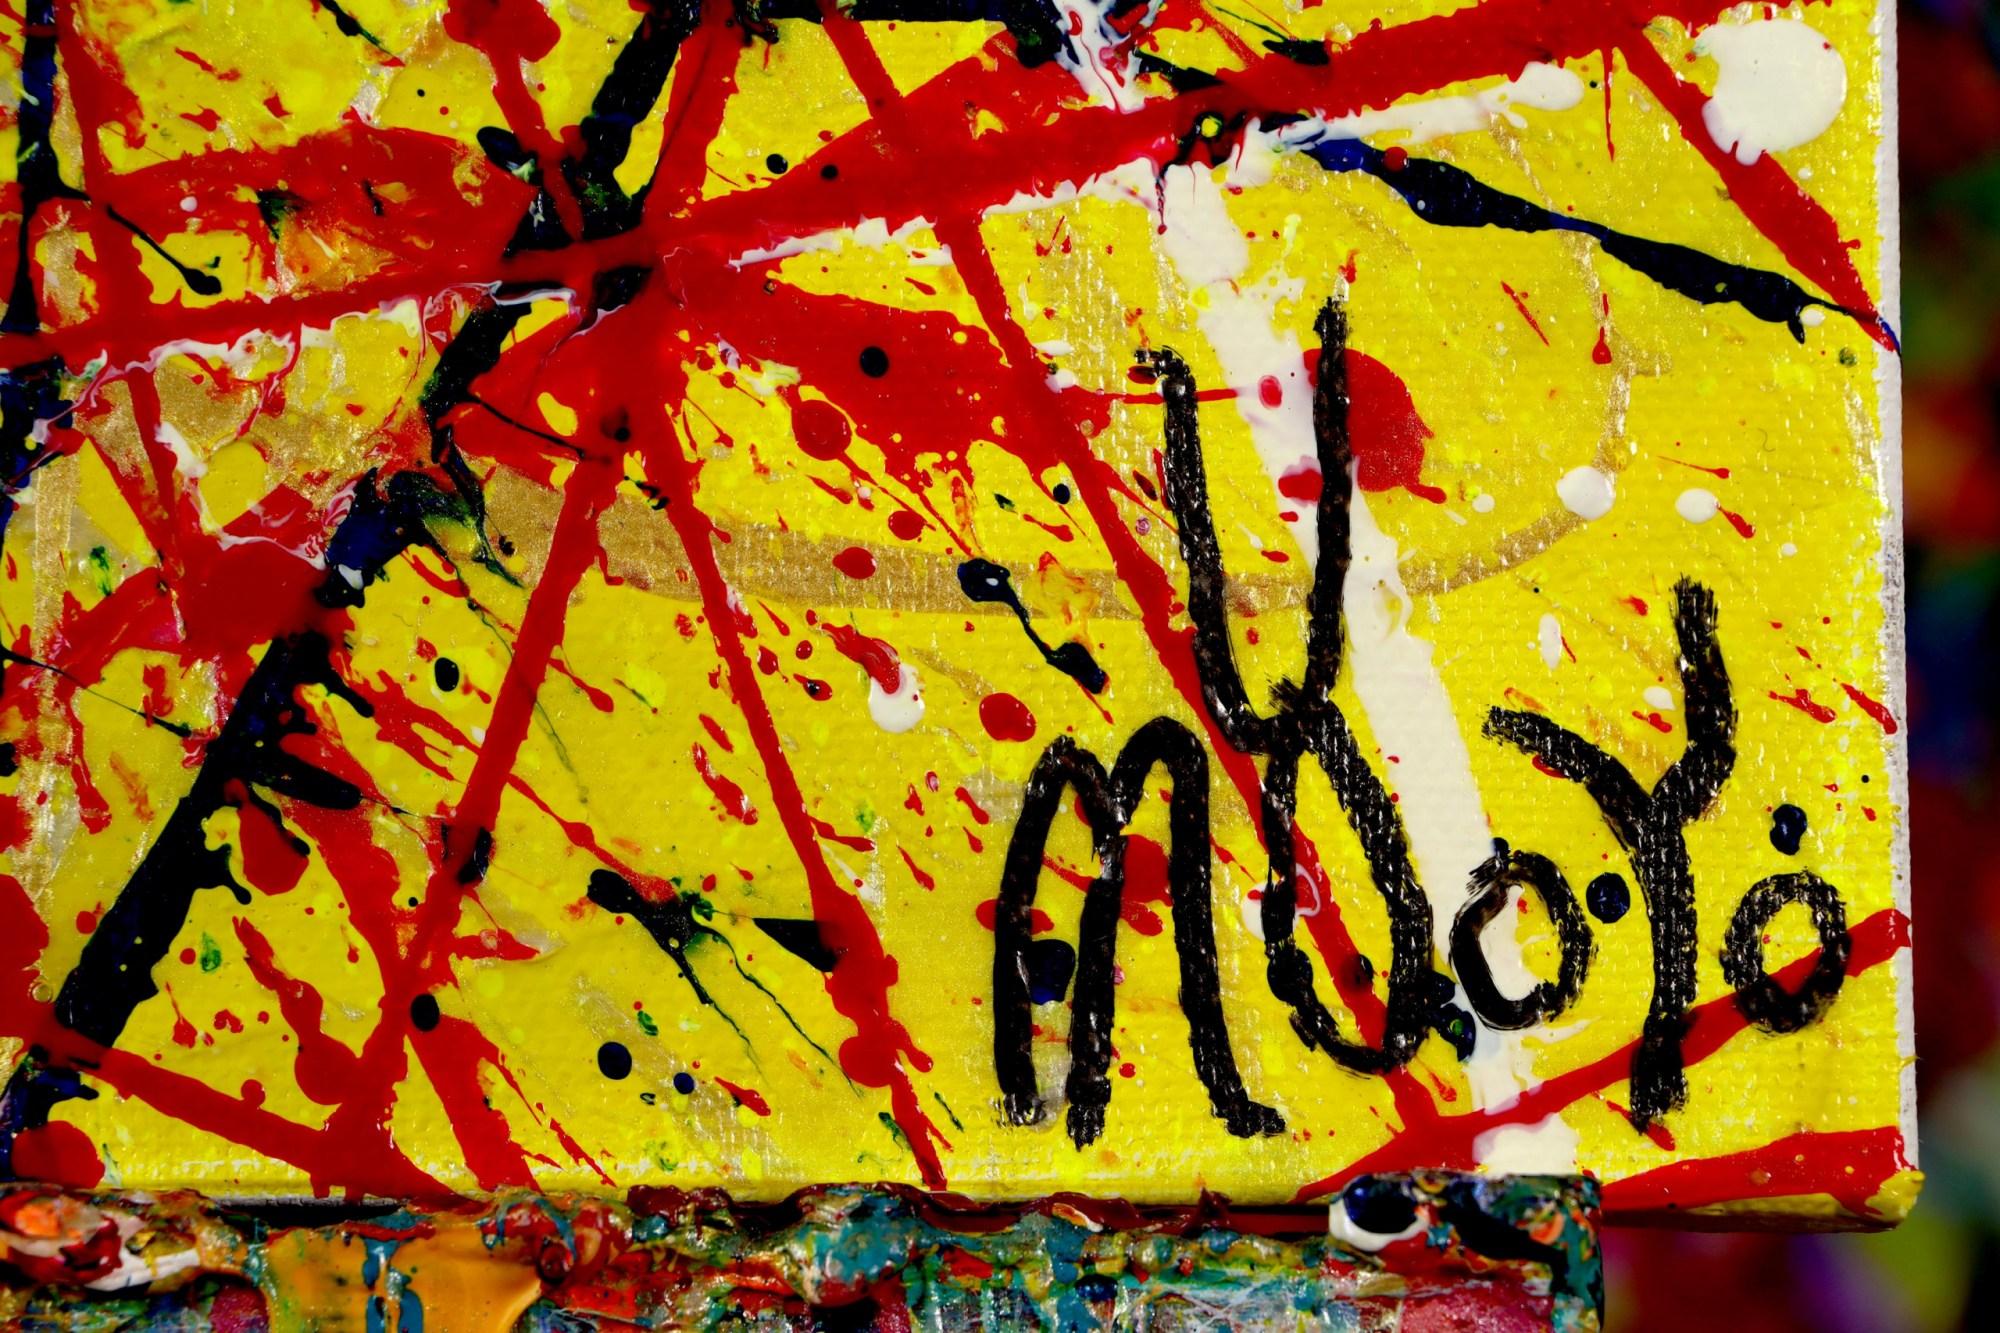 Colorful Display of Affection 3 (2021) / ARTIST: NESTOR TORO